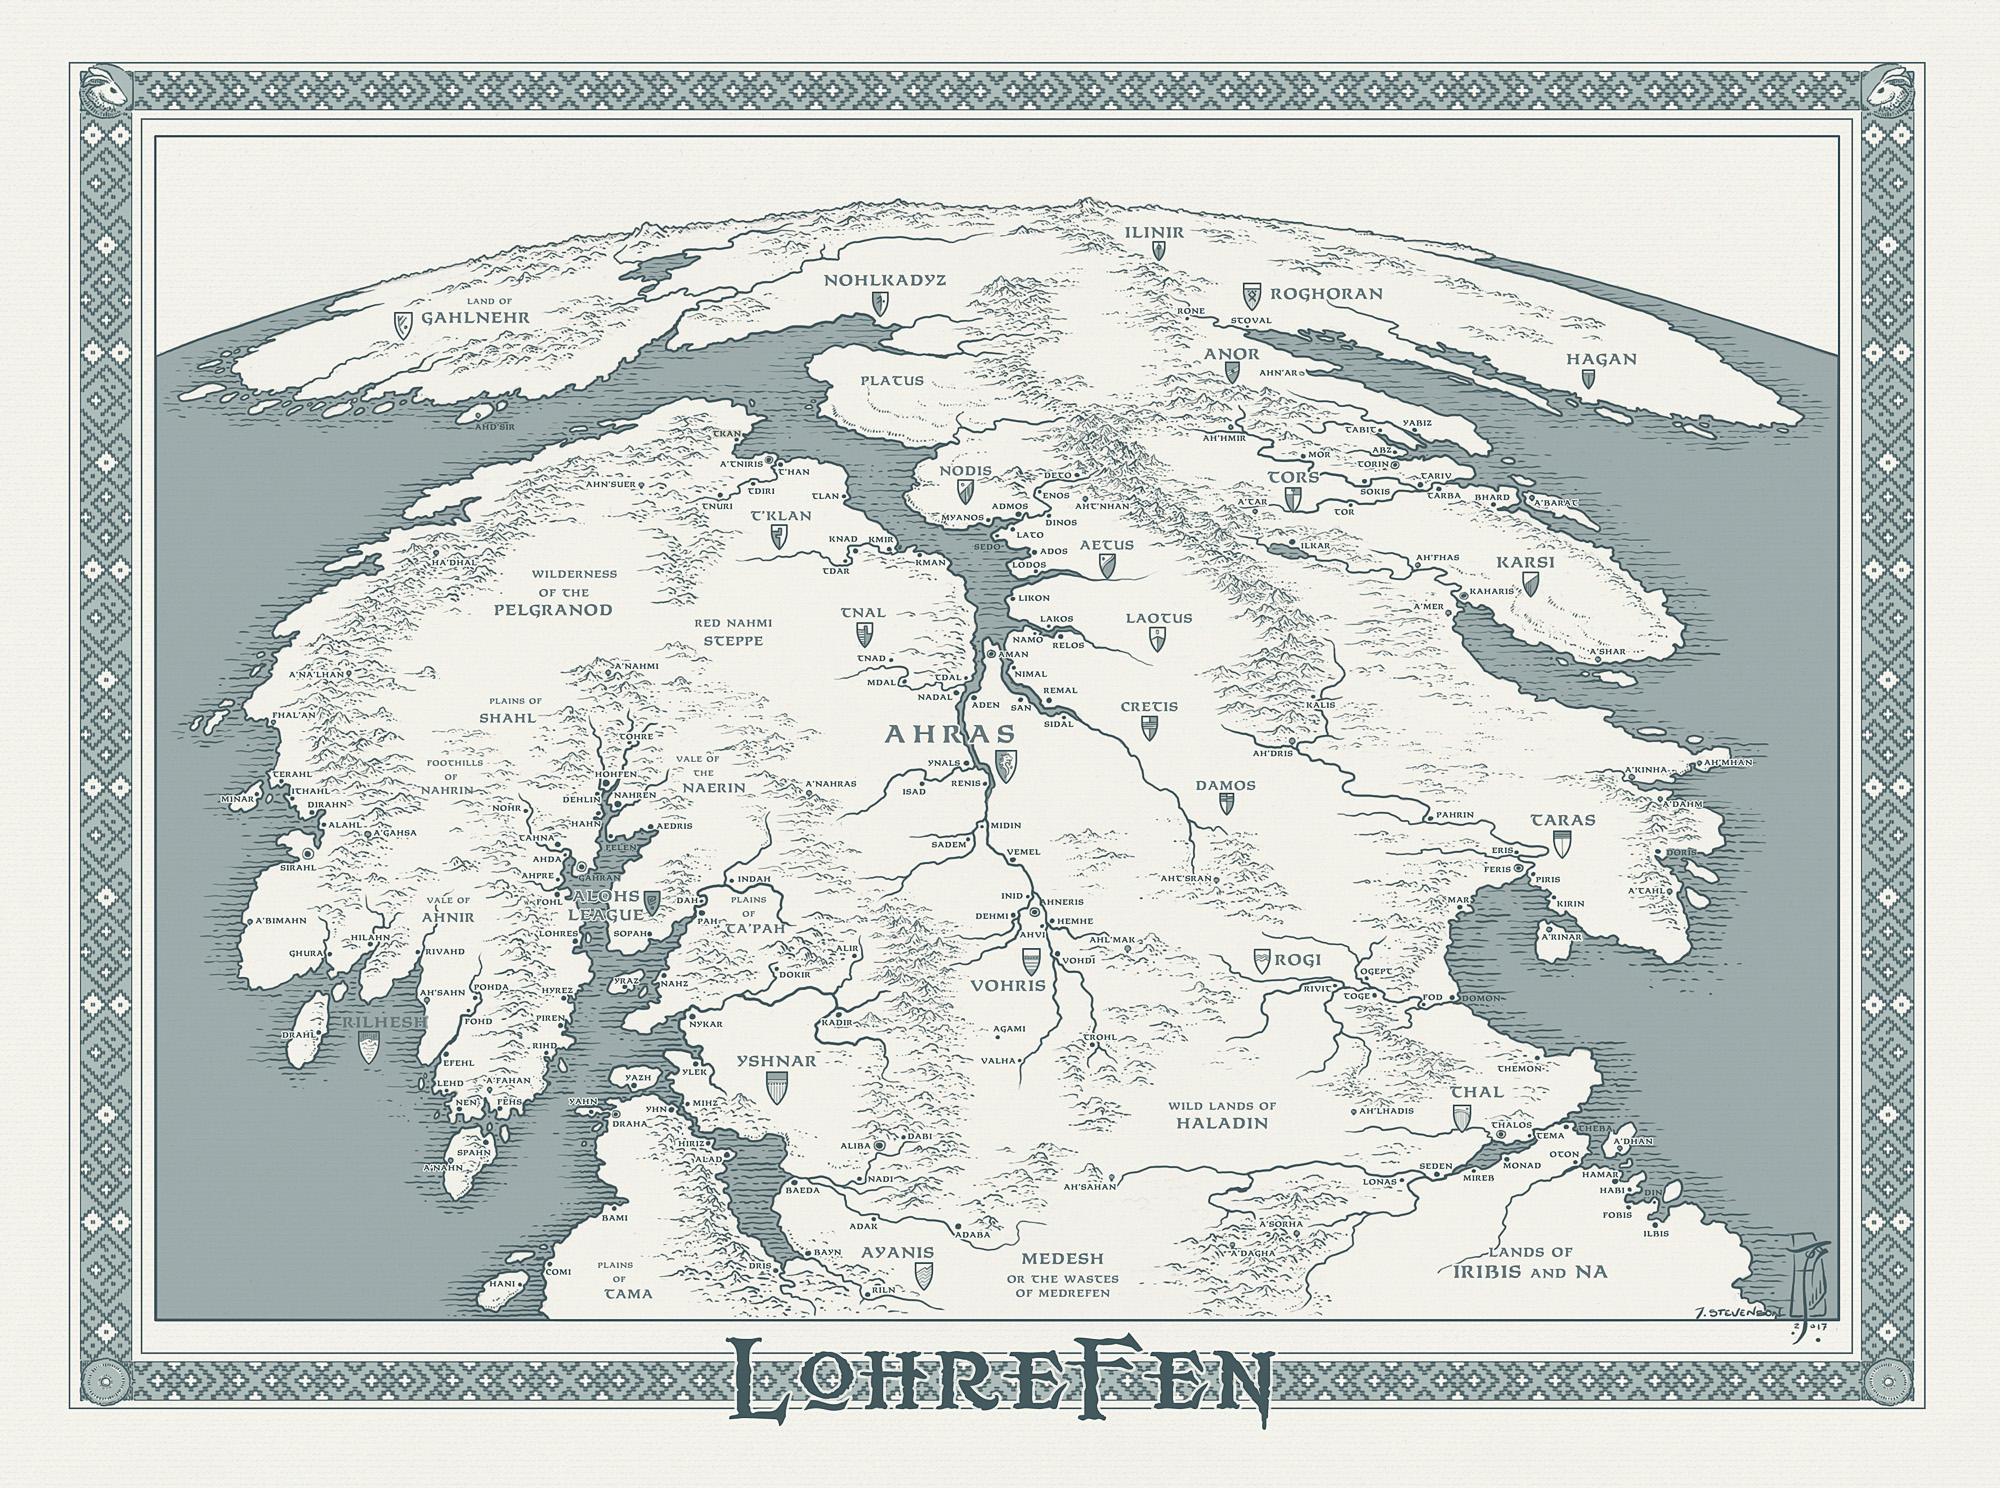 Lohrefen by SirInkman